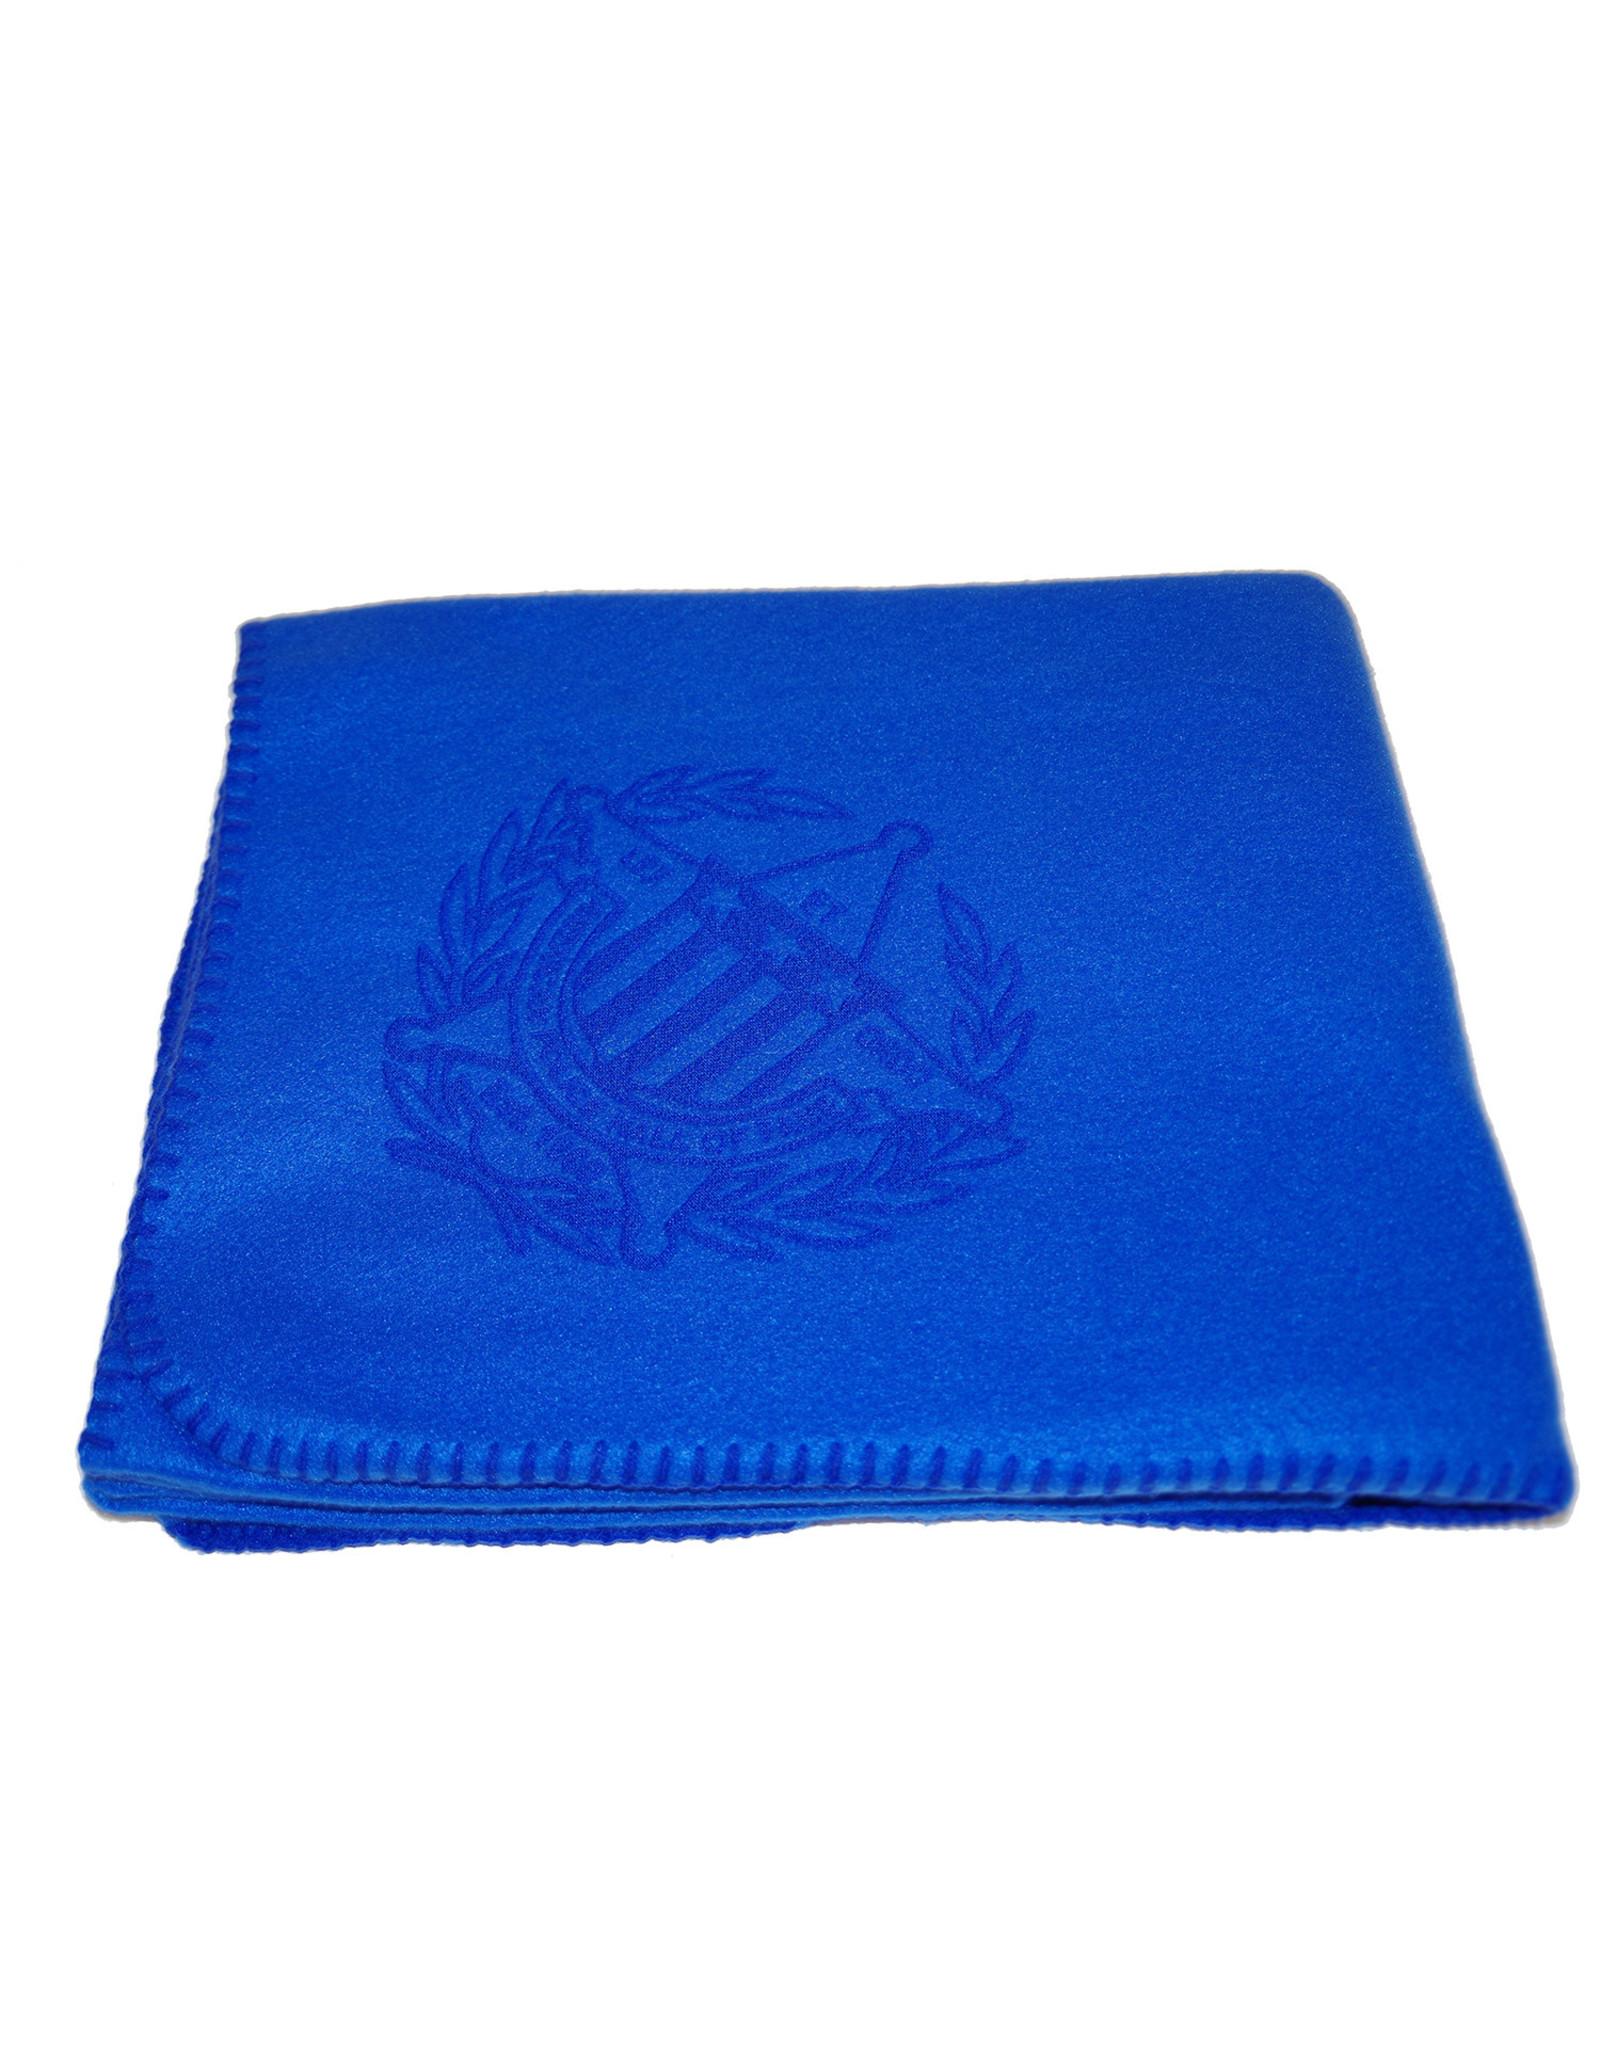 APHF Blanket